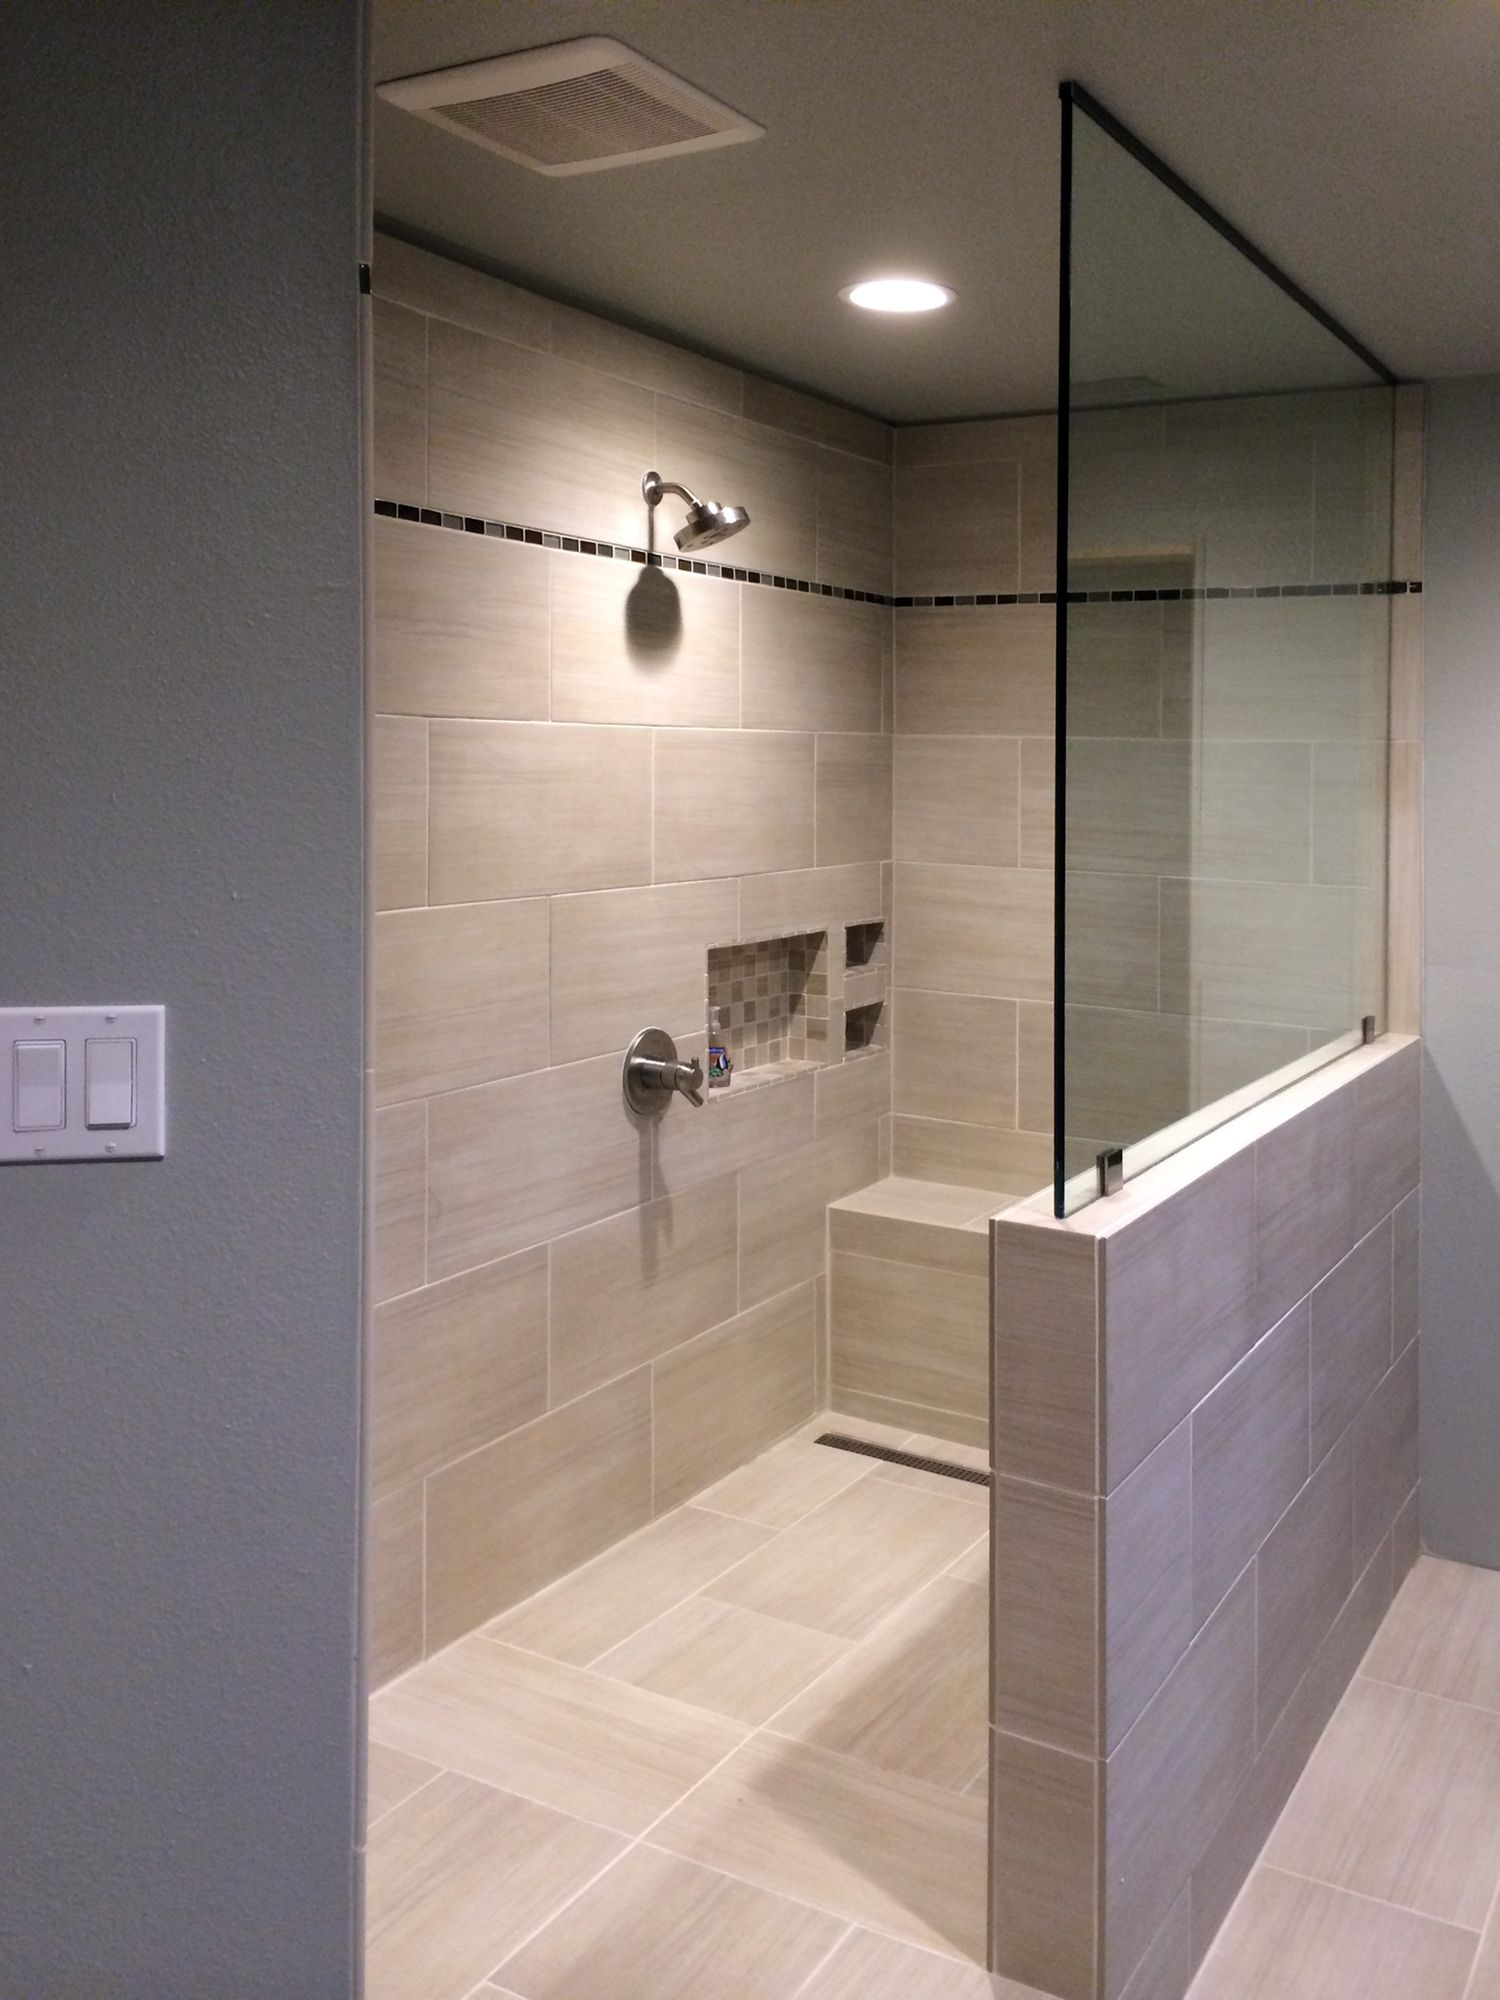 Shower Glass Half Panel Splash | Showers | Pinterest ...